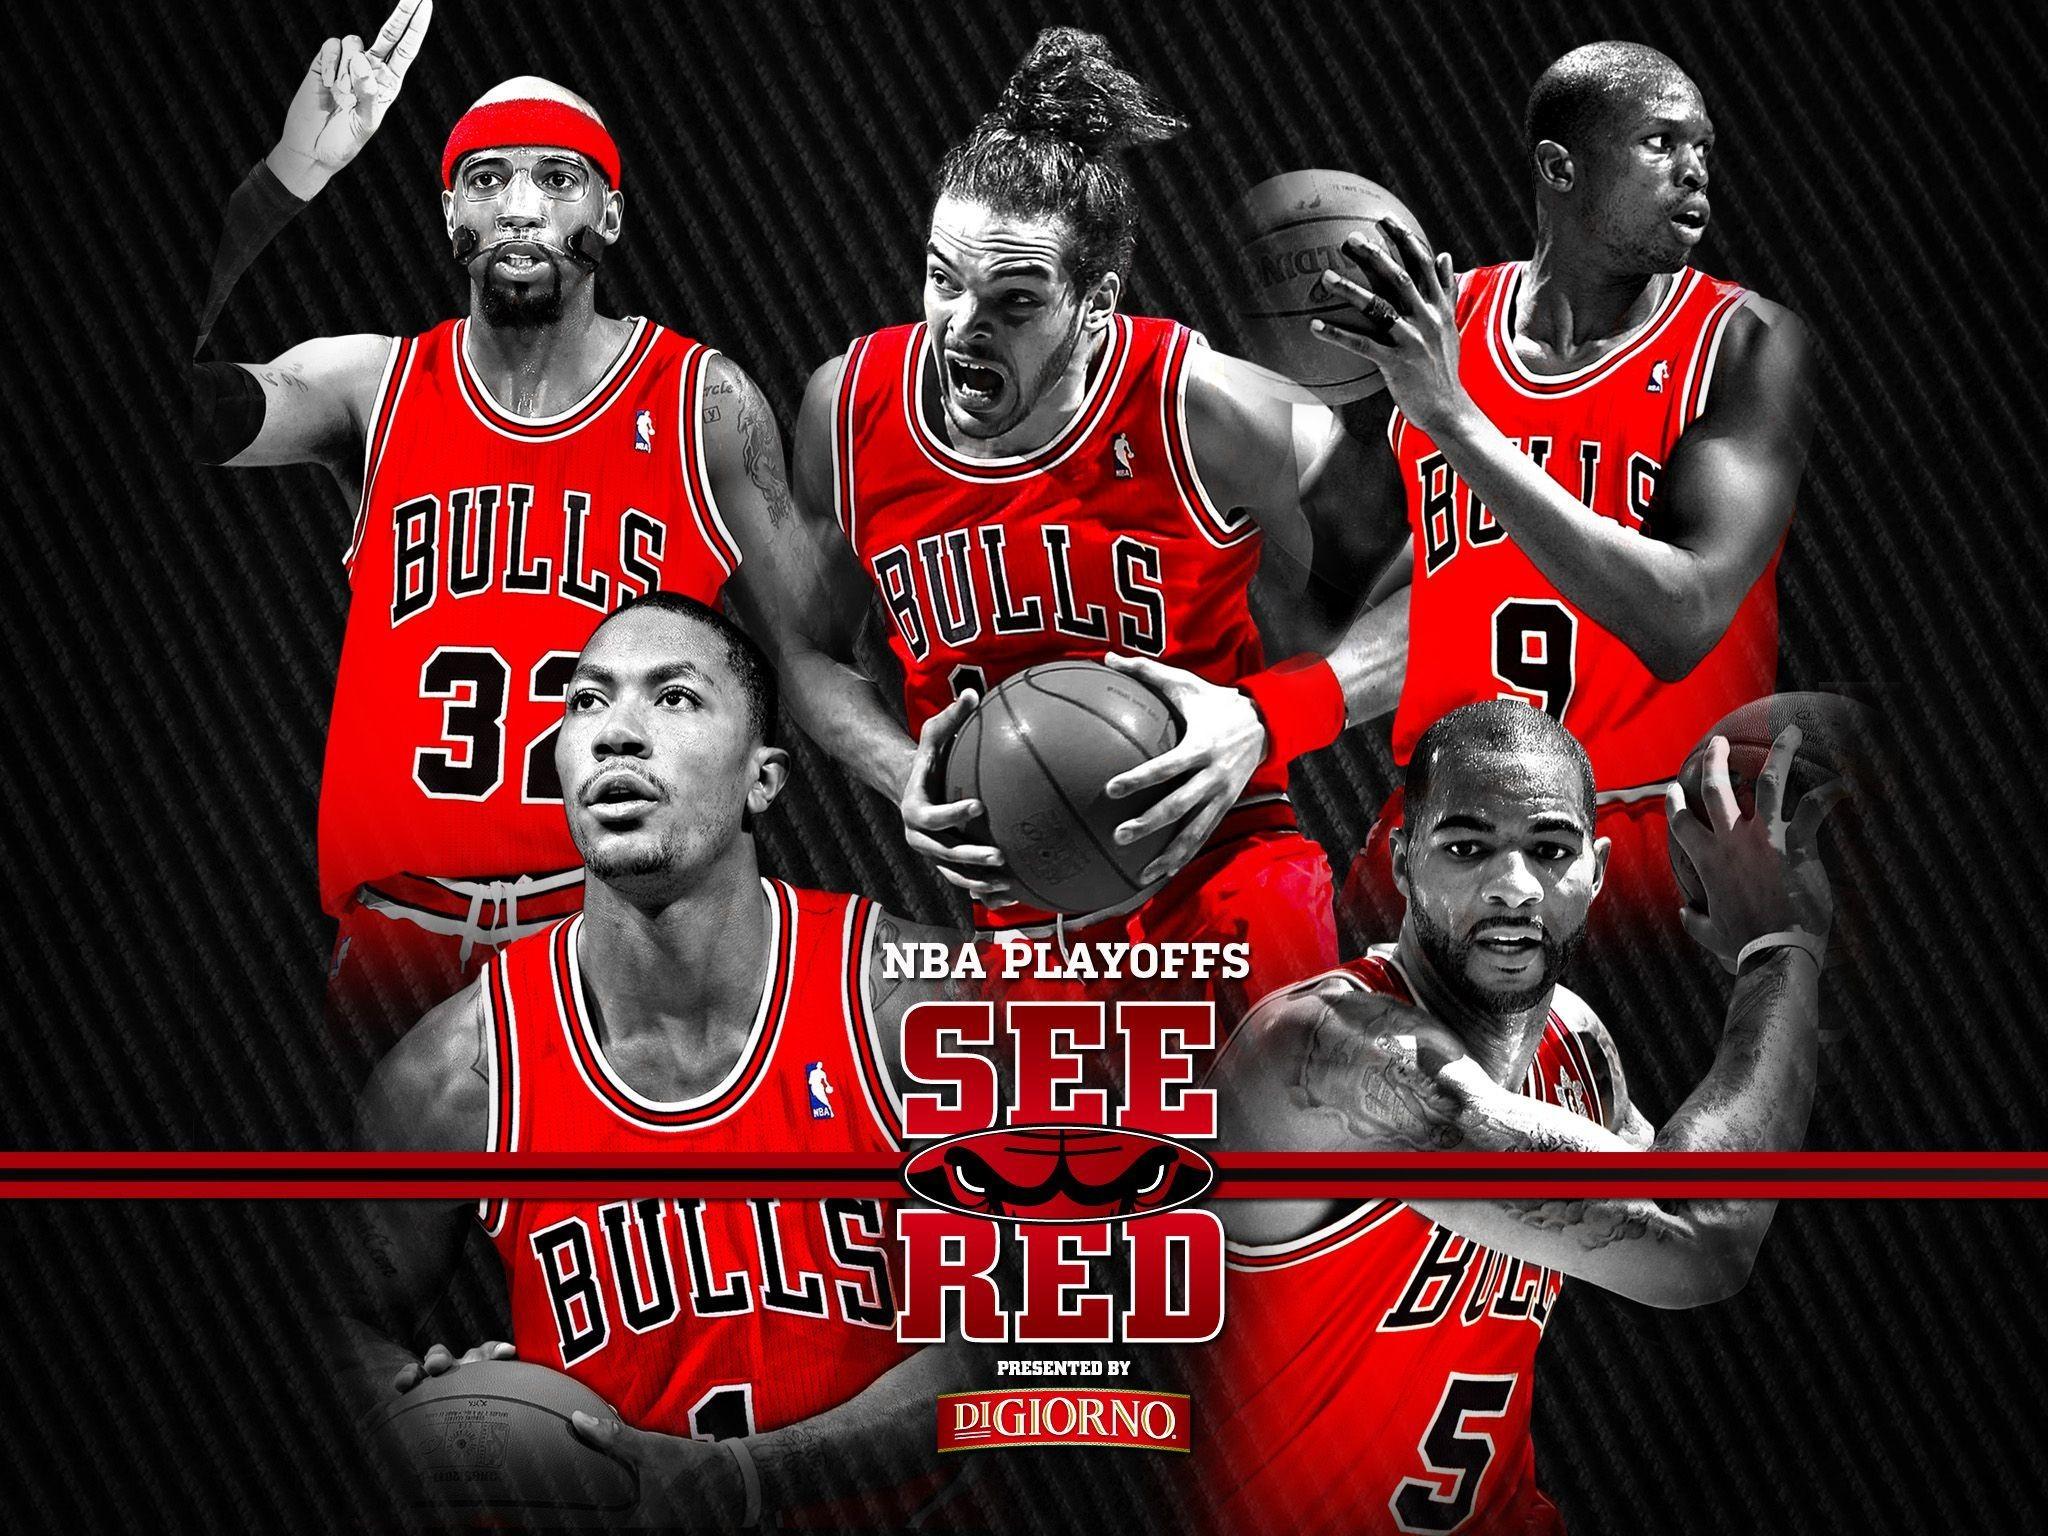 2048x1536 Chicago Bulls Wallpapers HD Wallpaper 1440×810 Chicago Bulls Wallpaper (43 Wallpapers)